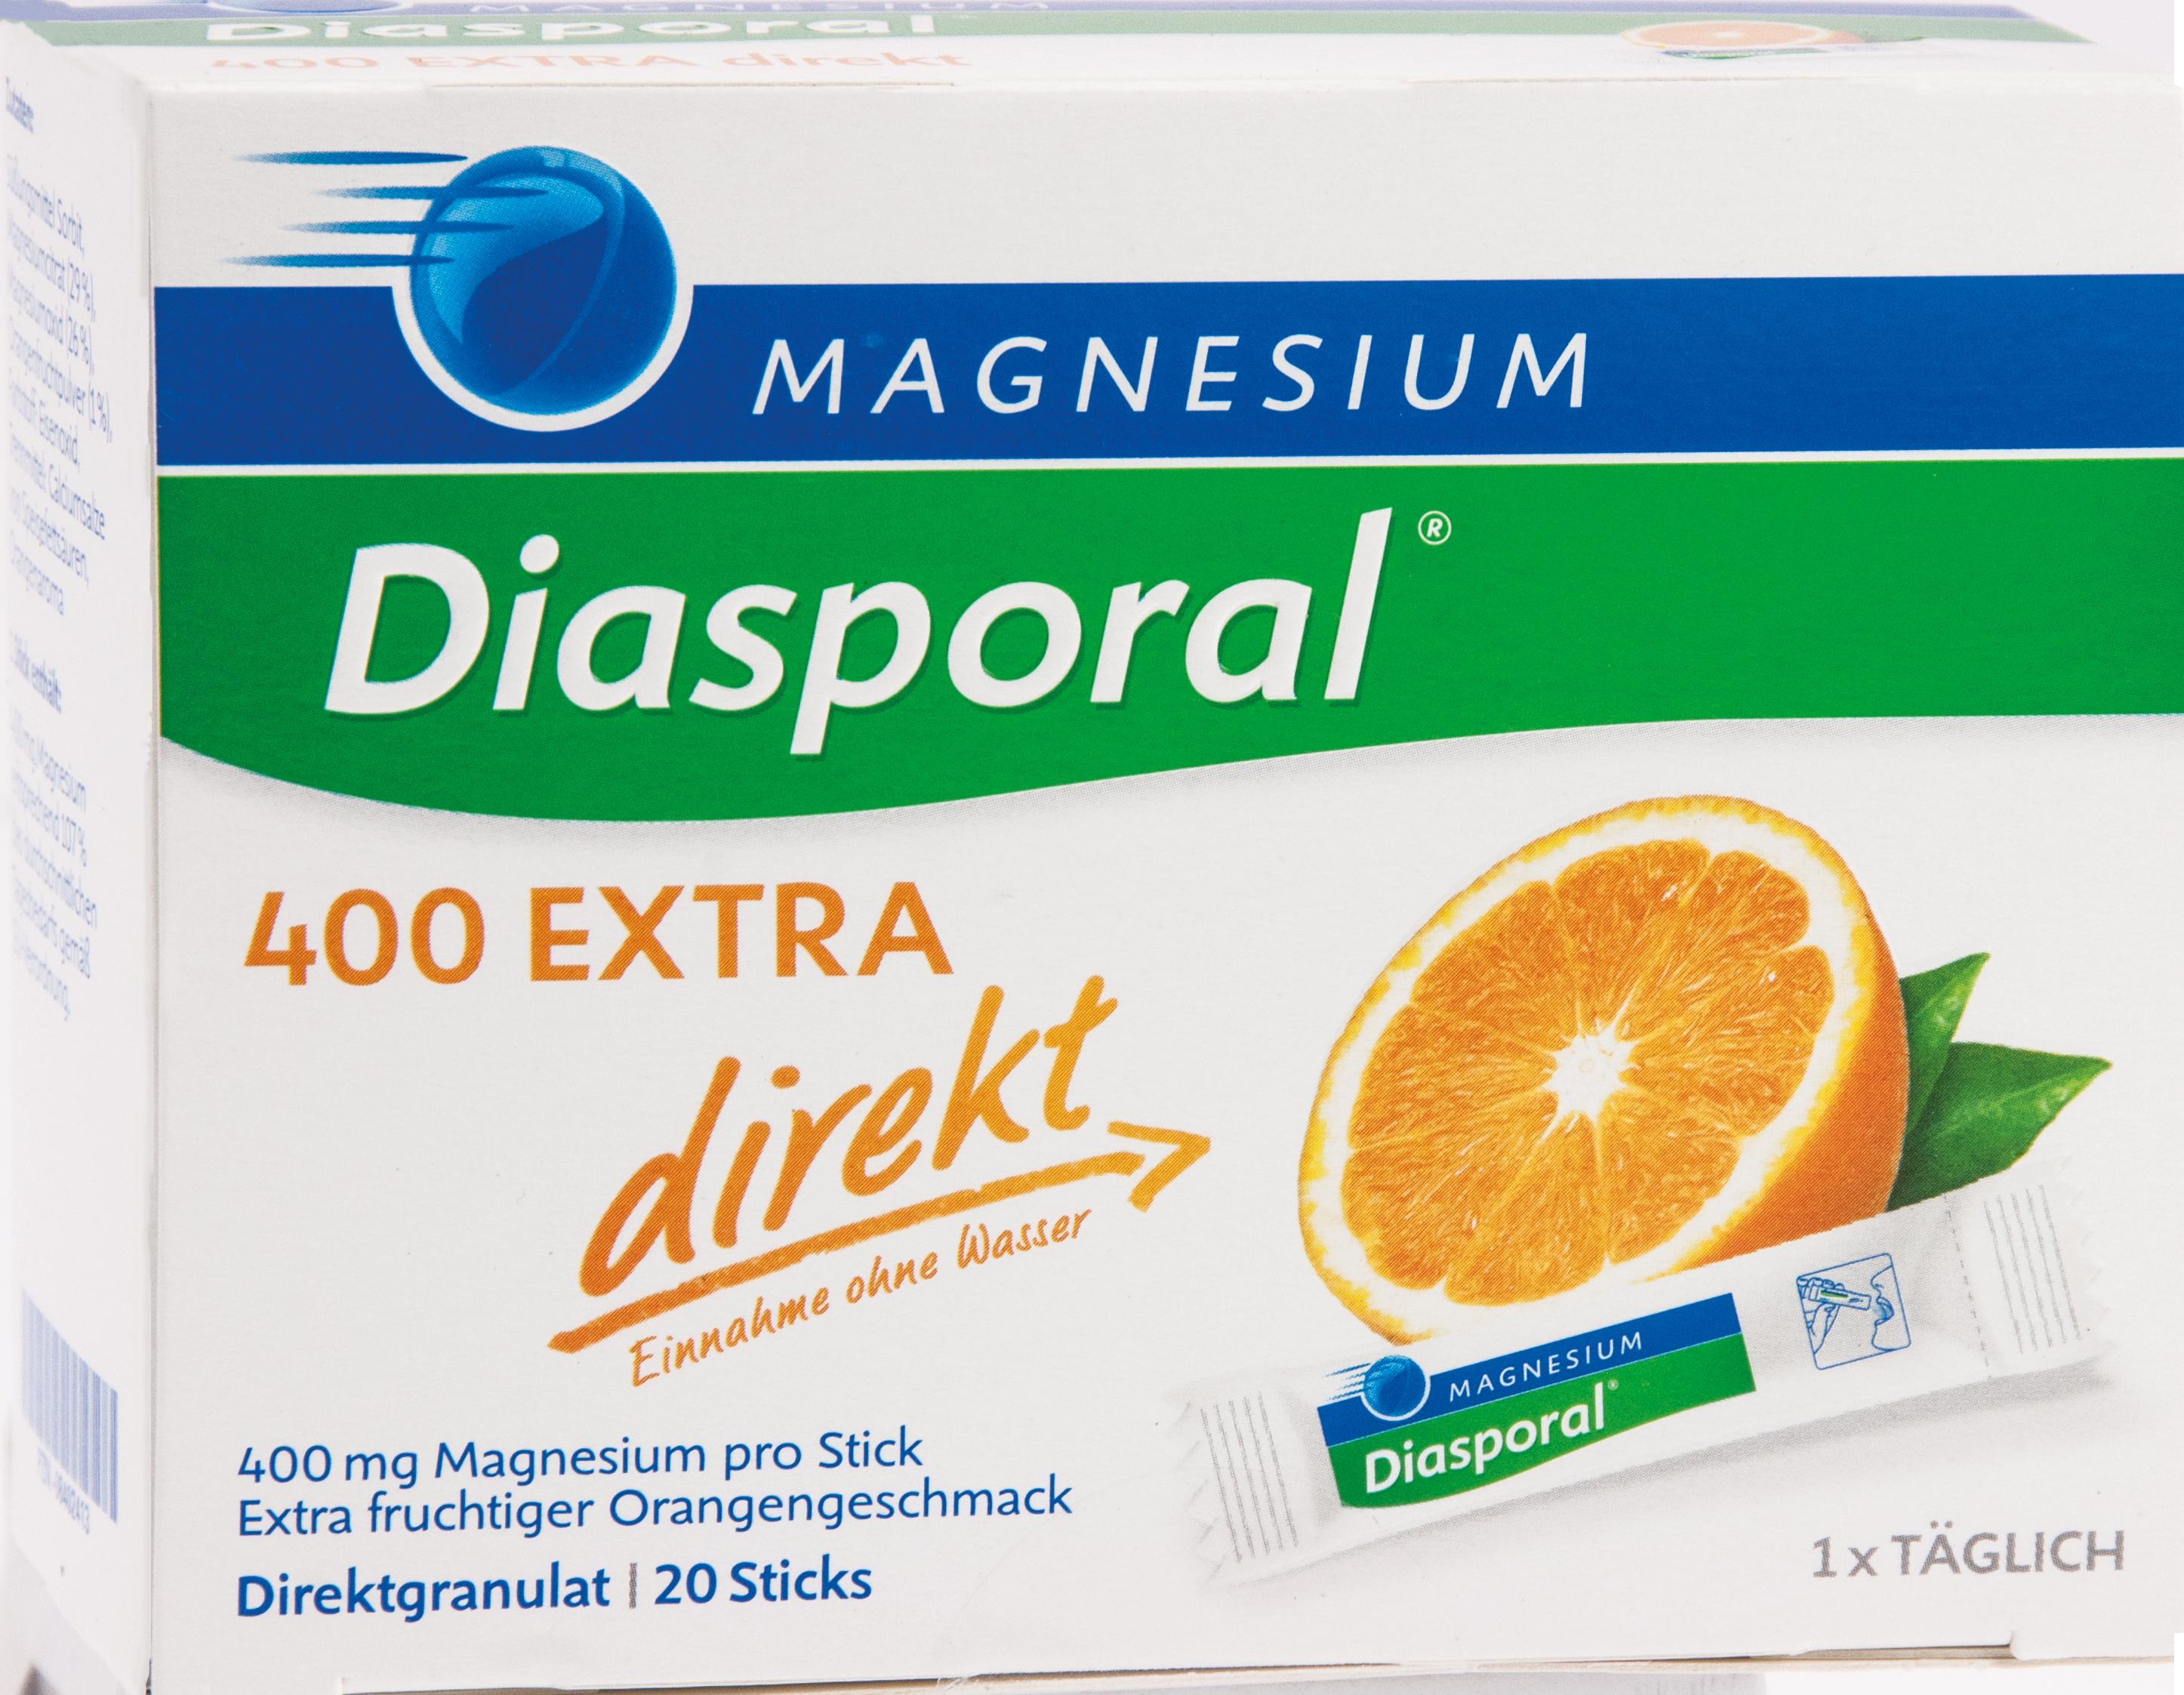 Magnesium-Diasporal 400 Extra direkt